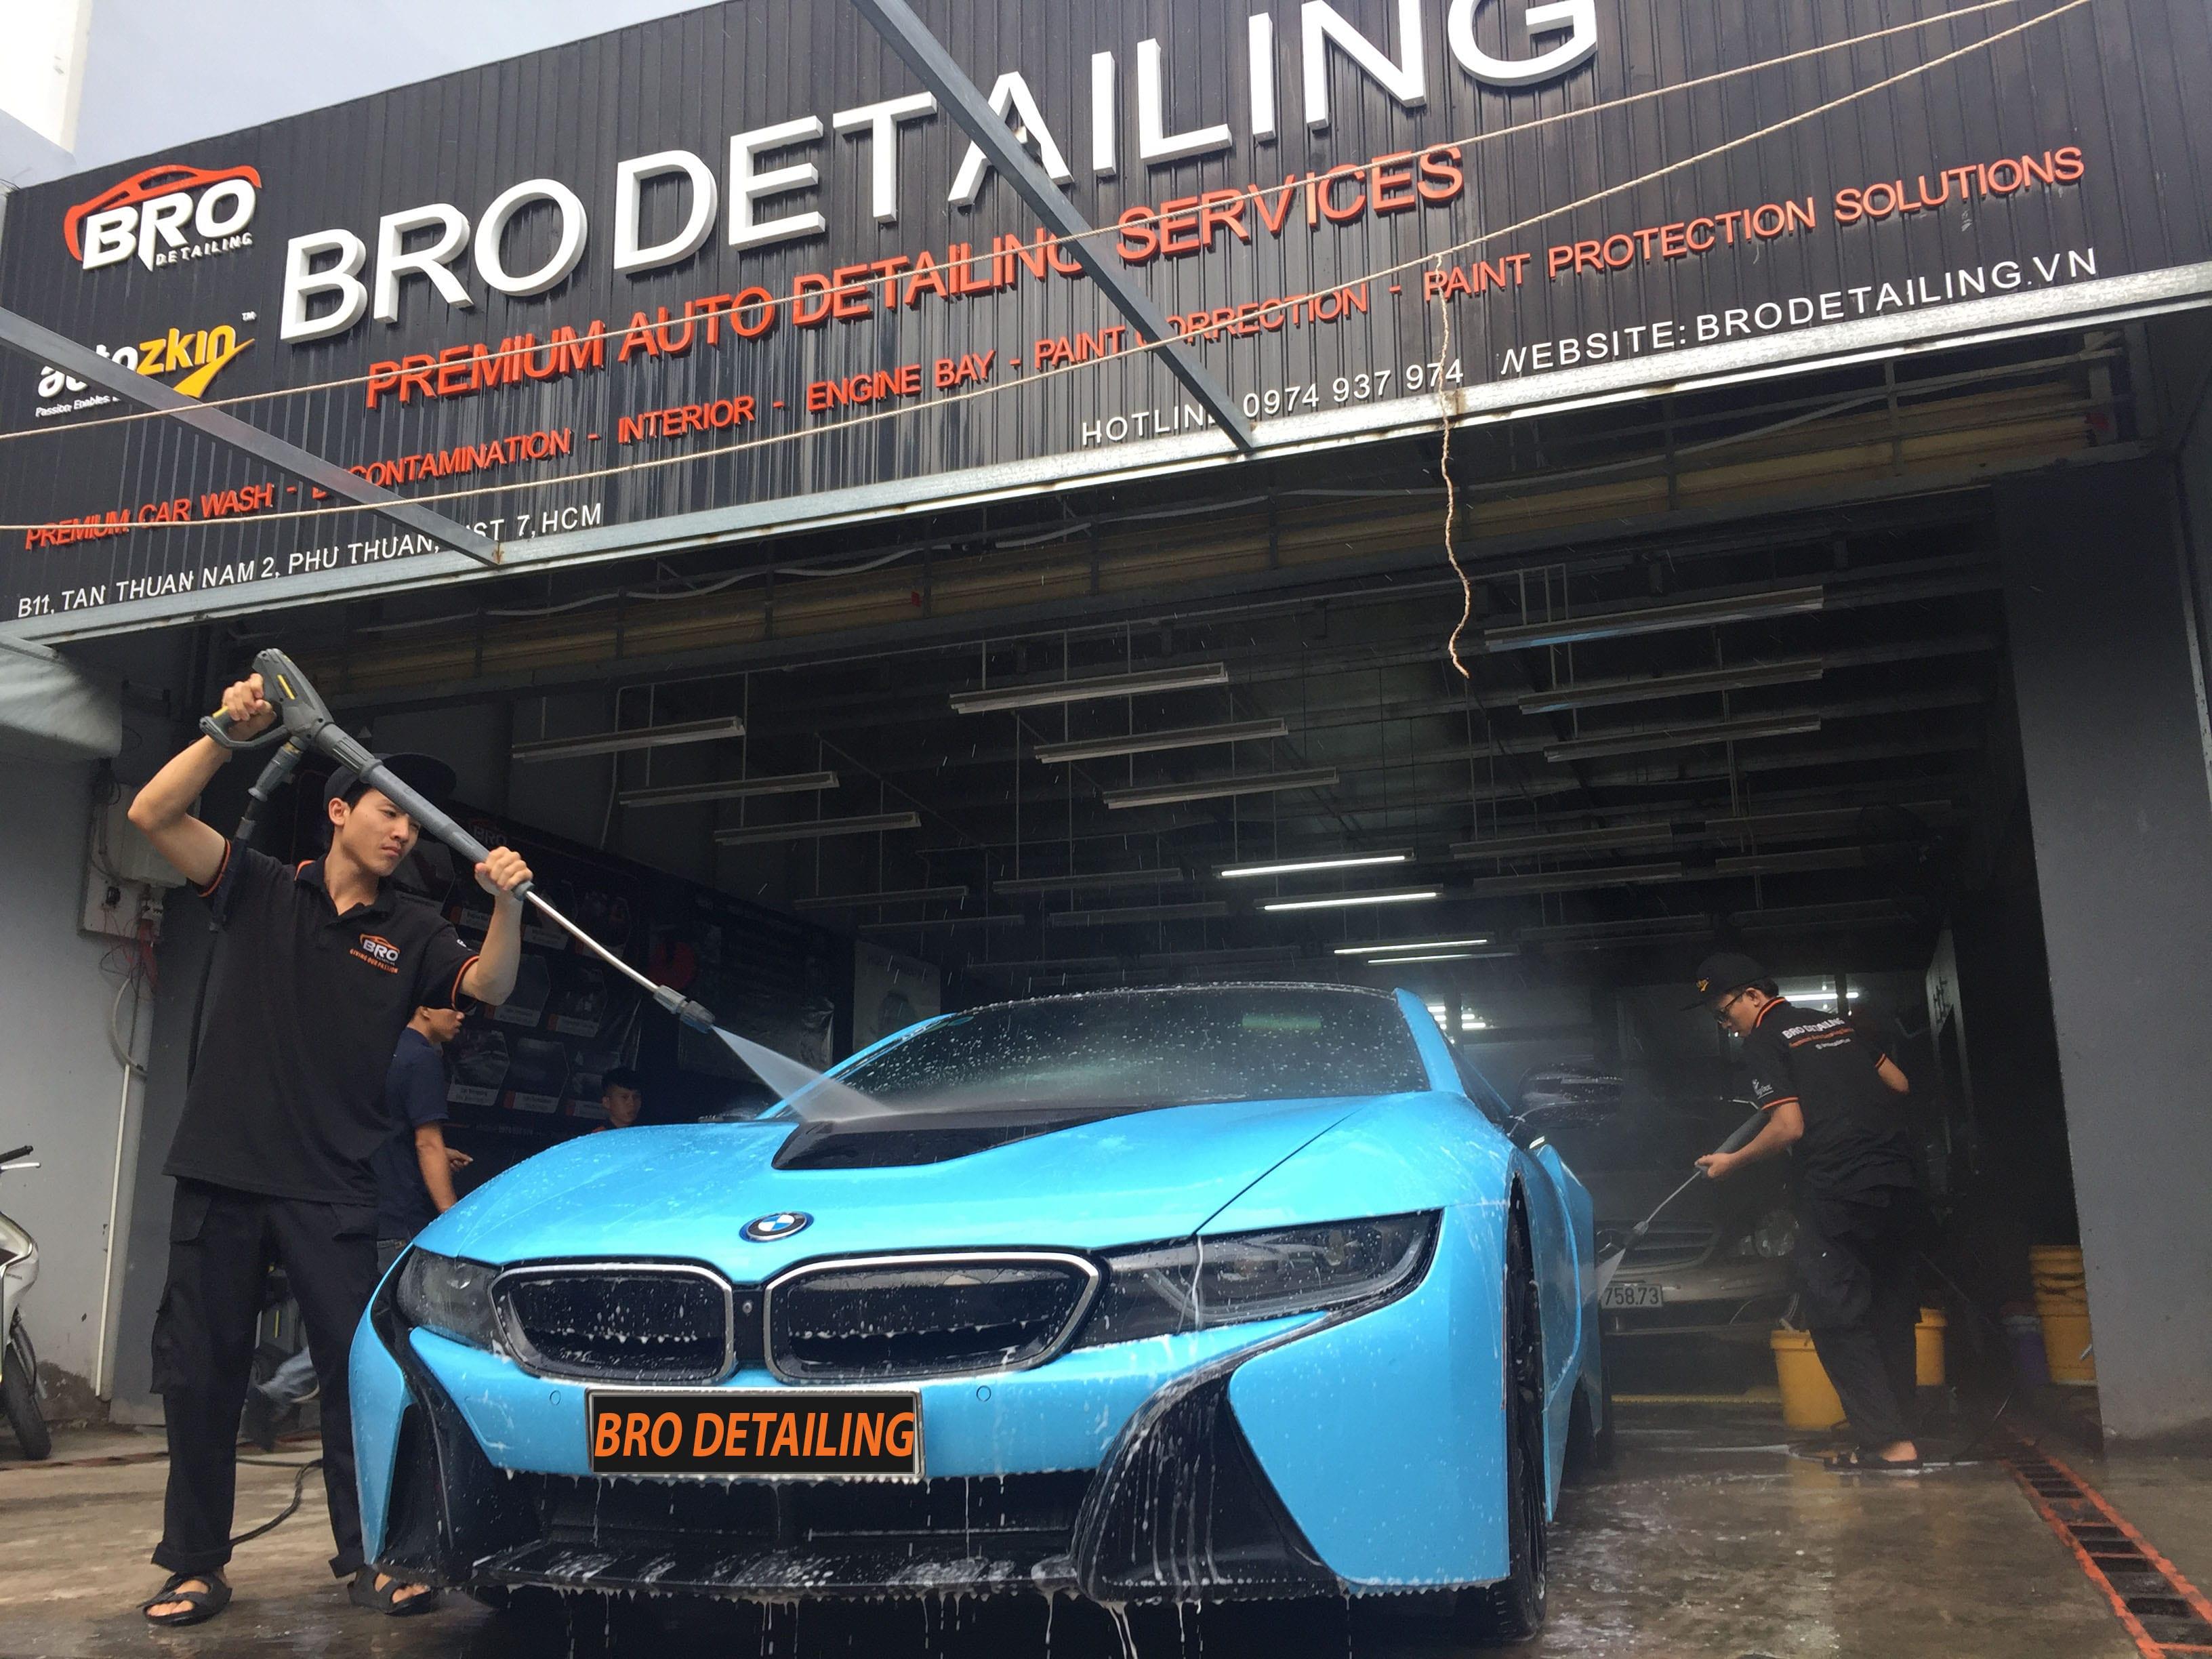 rửa xe tại Bro Detailing